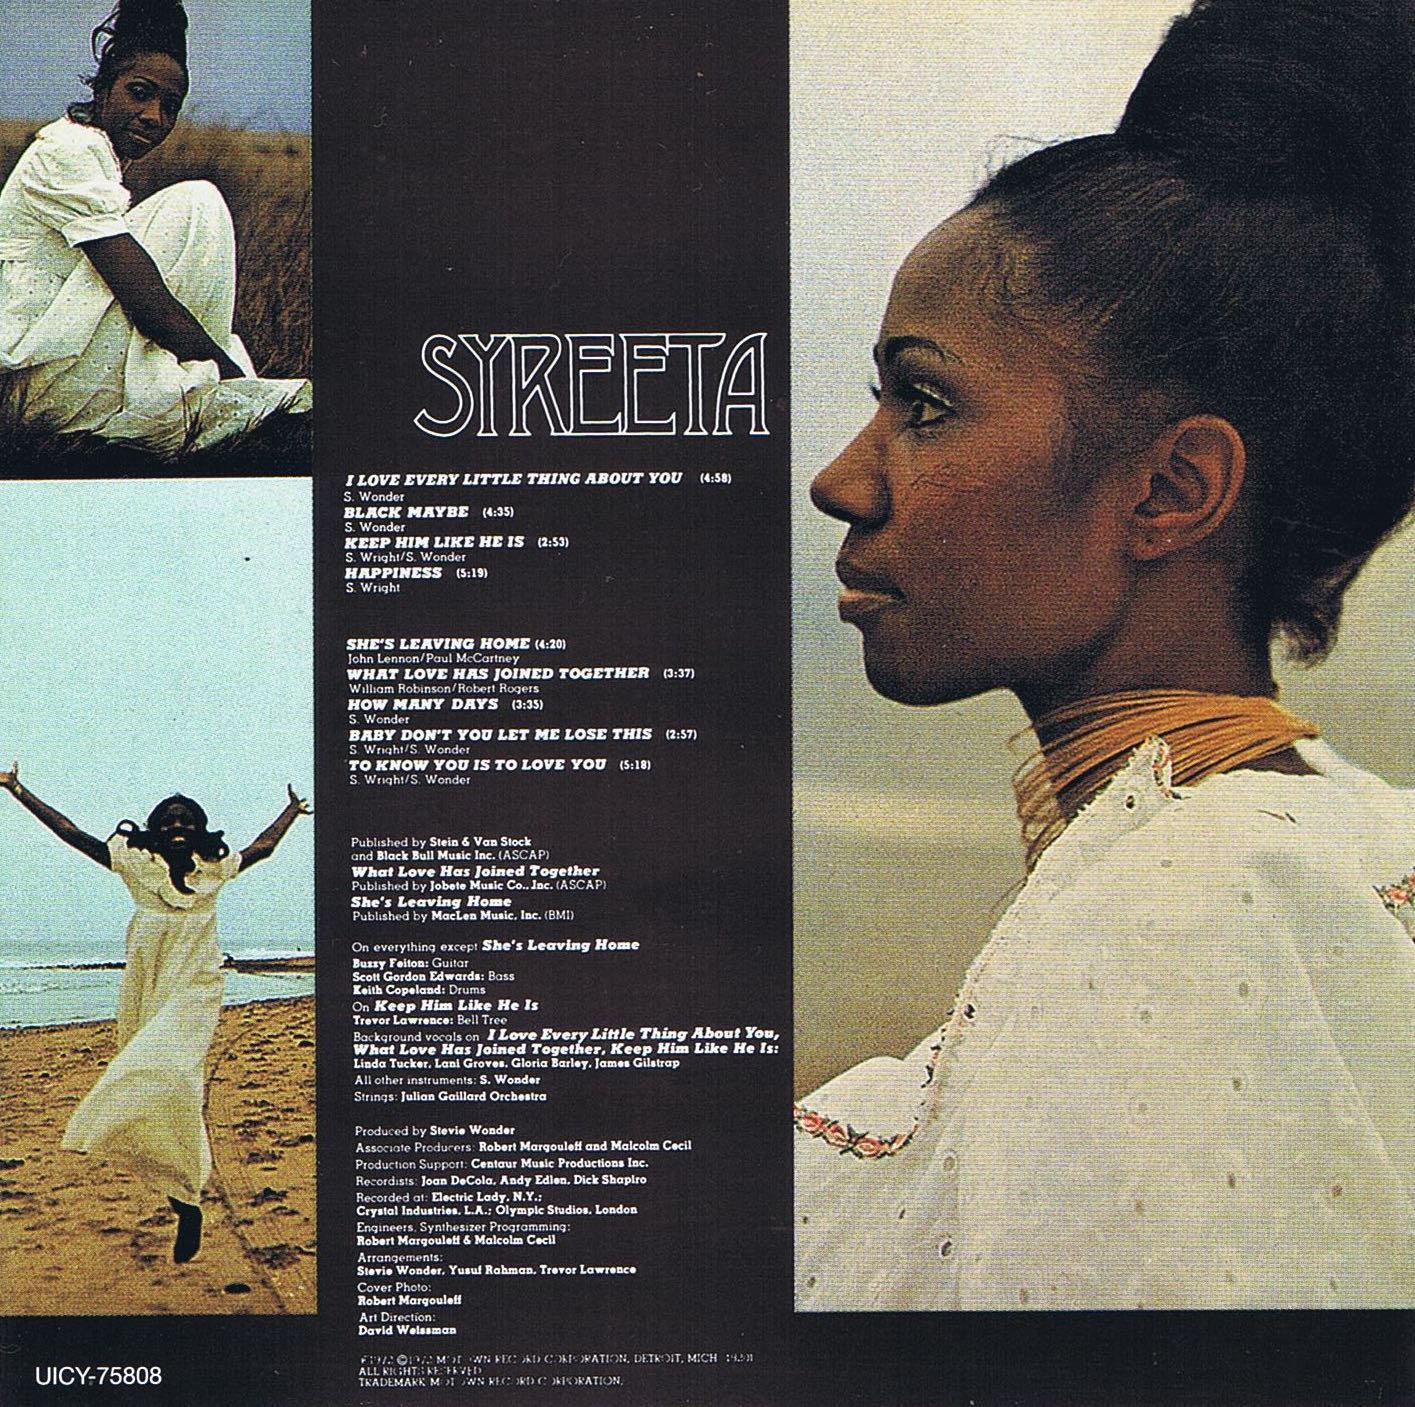 Syreeta back